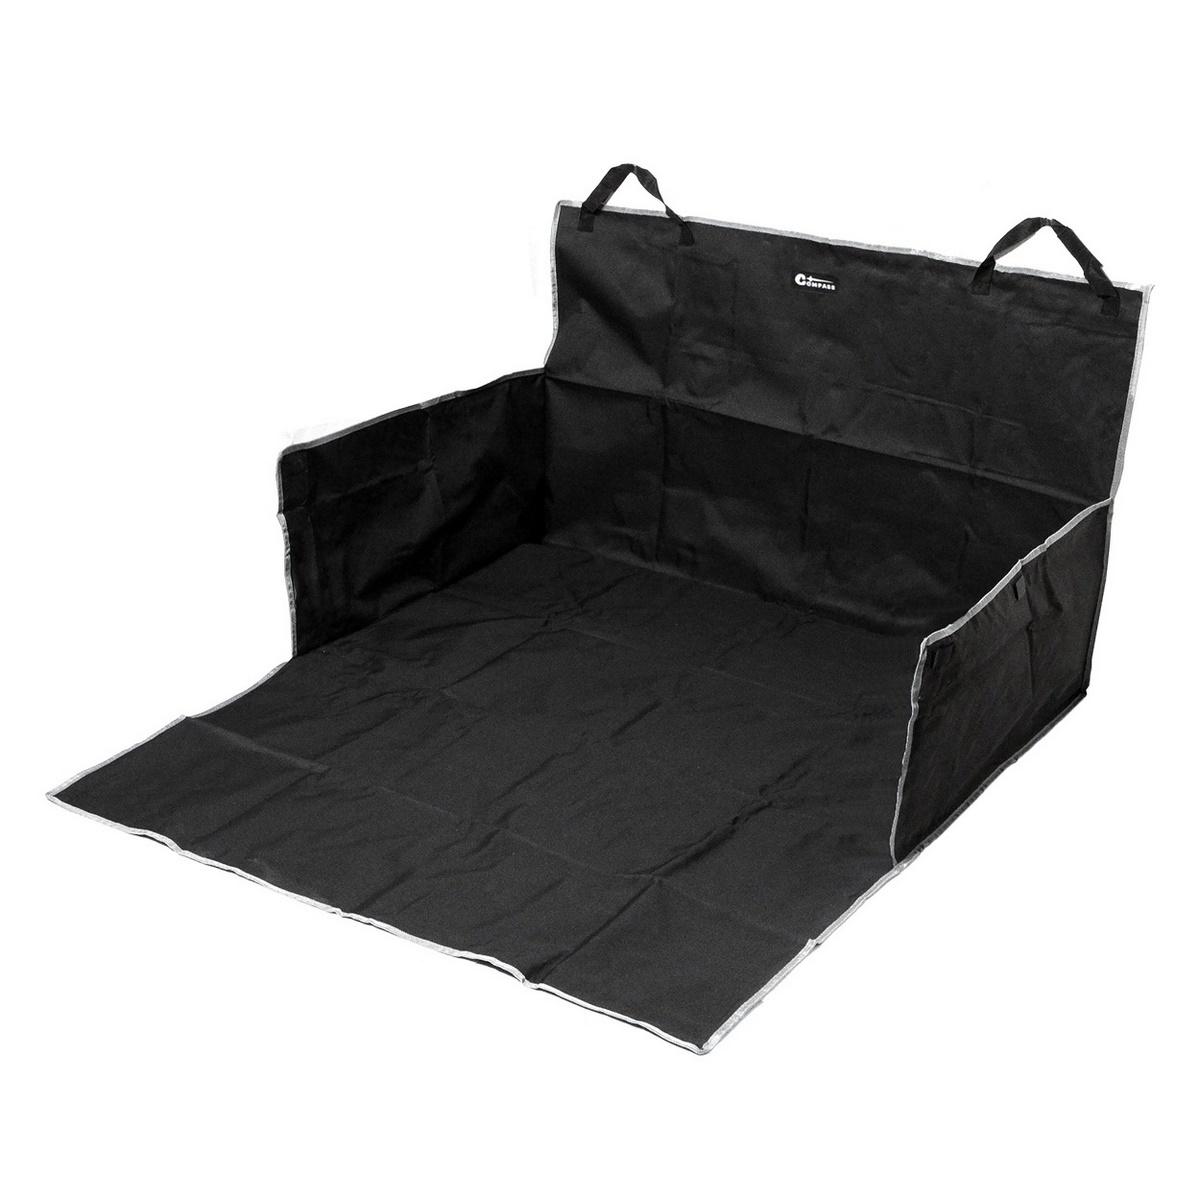 Compass Ochranná deka do kufru, 125 x 100 x 60 cm